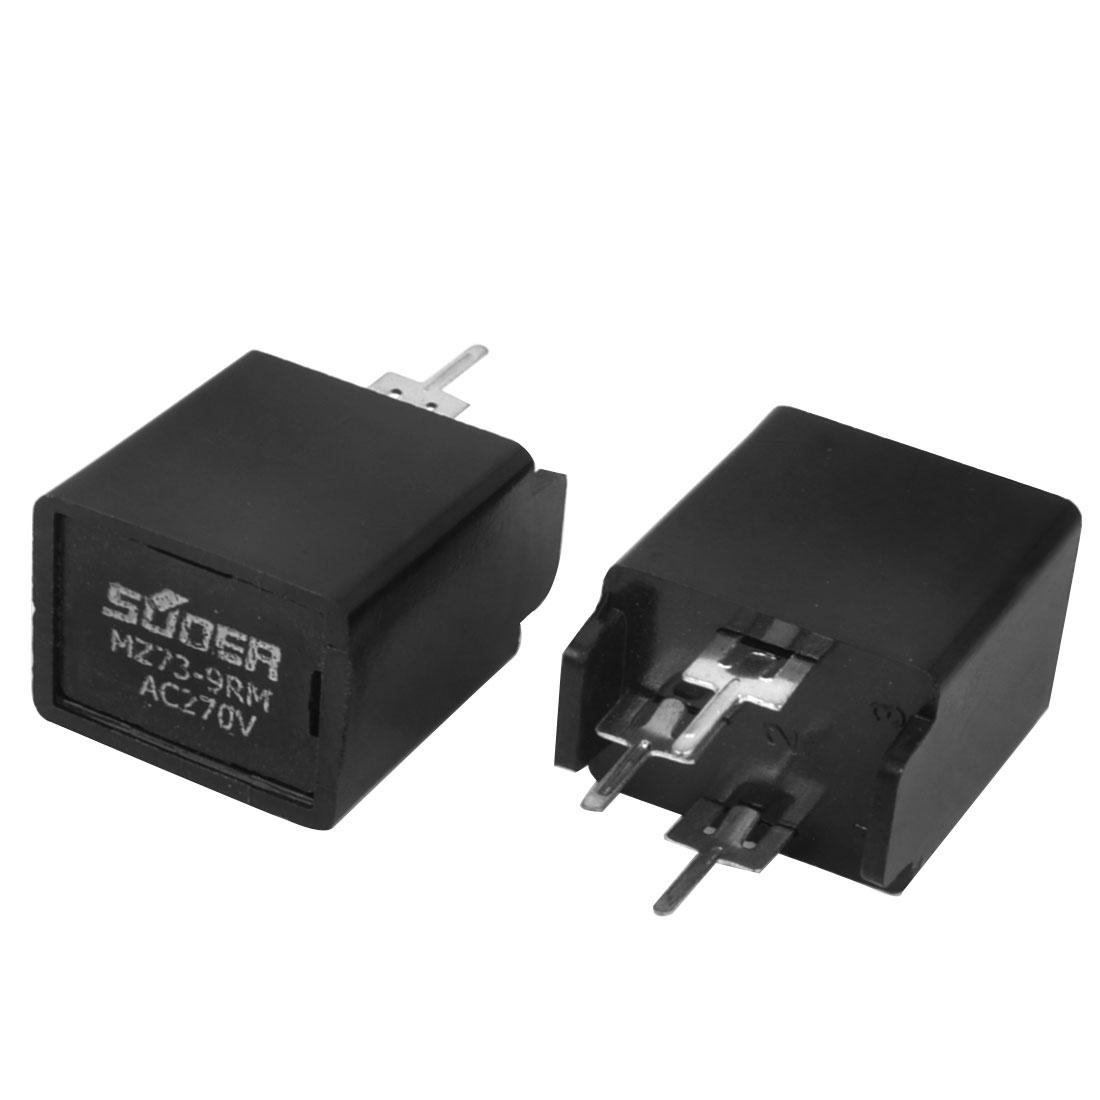 2 PCS 3 Terminals 9 Ohm AC 270V Thermistor Degaussing Resistor MZ73-9RM